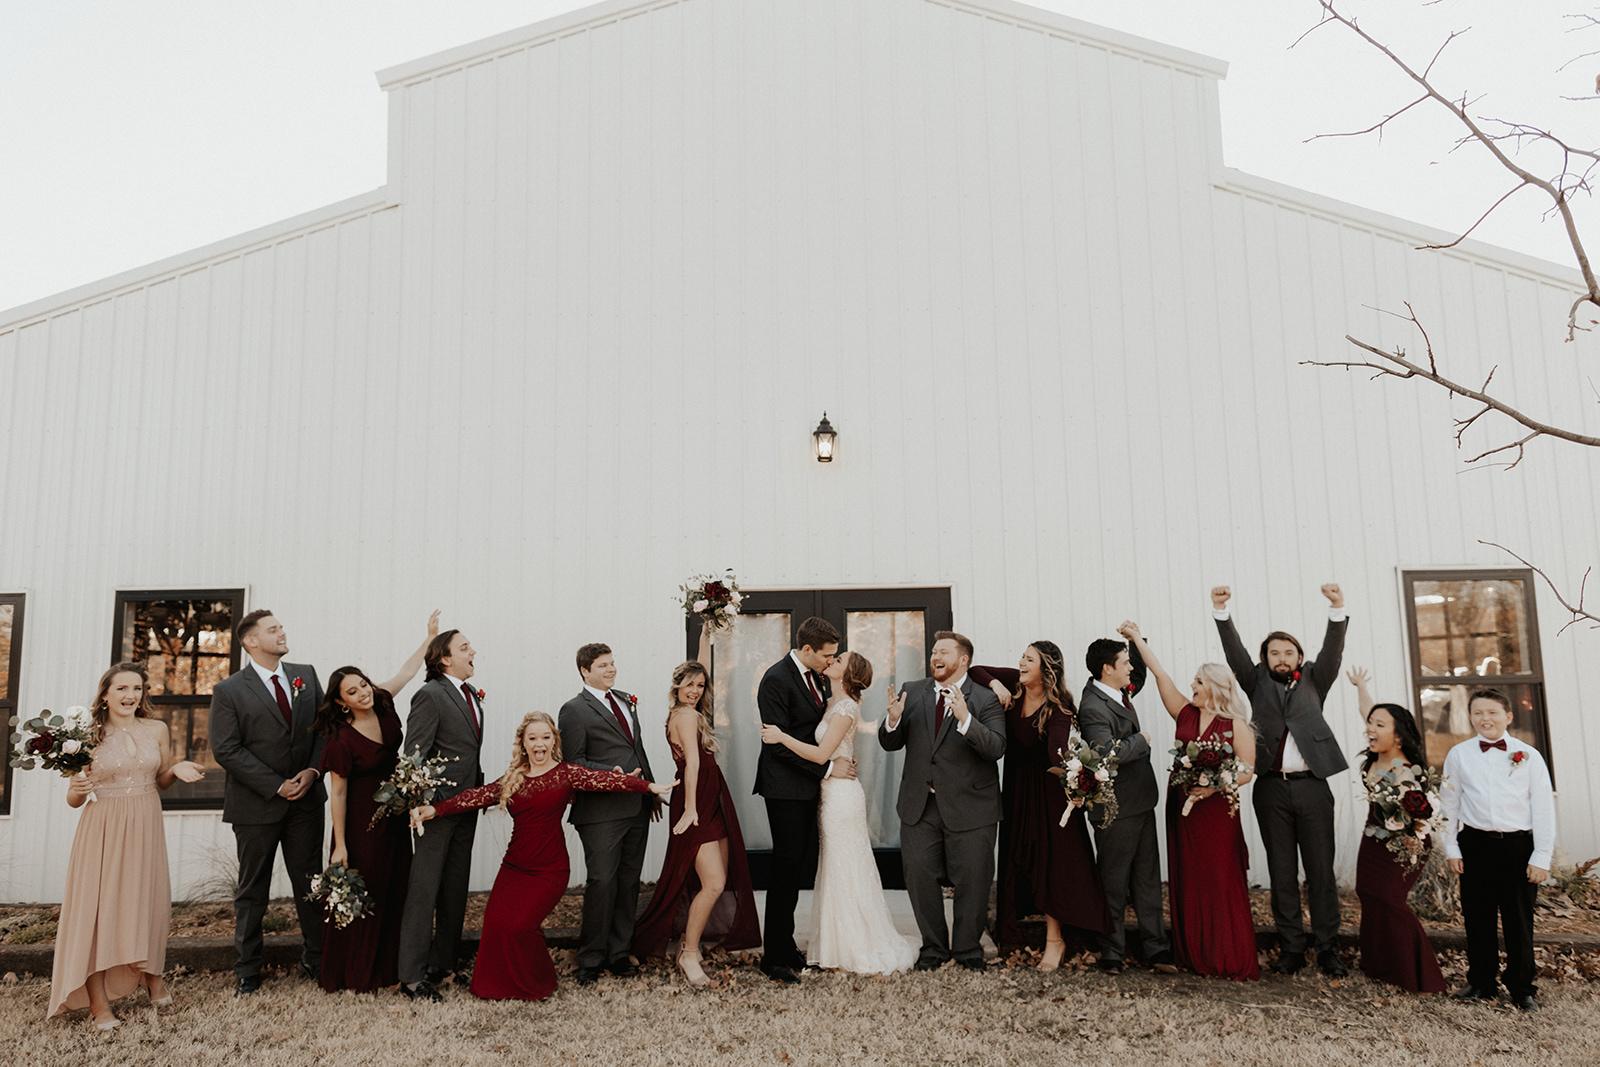 Best Wedding Venue in Tulsa Bixby Dream Point Ranch 20g.jpg